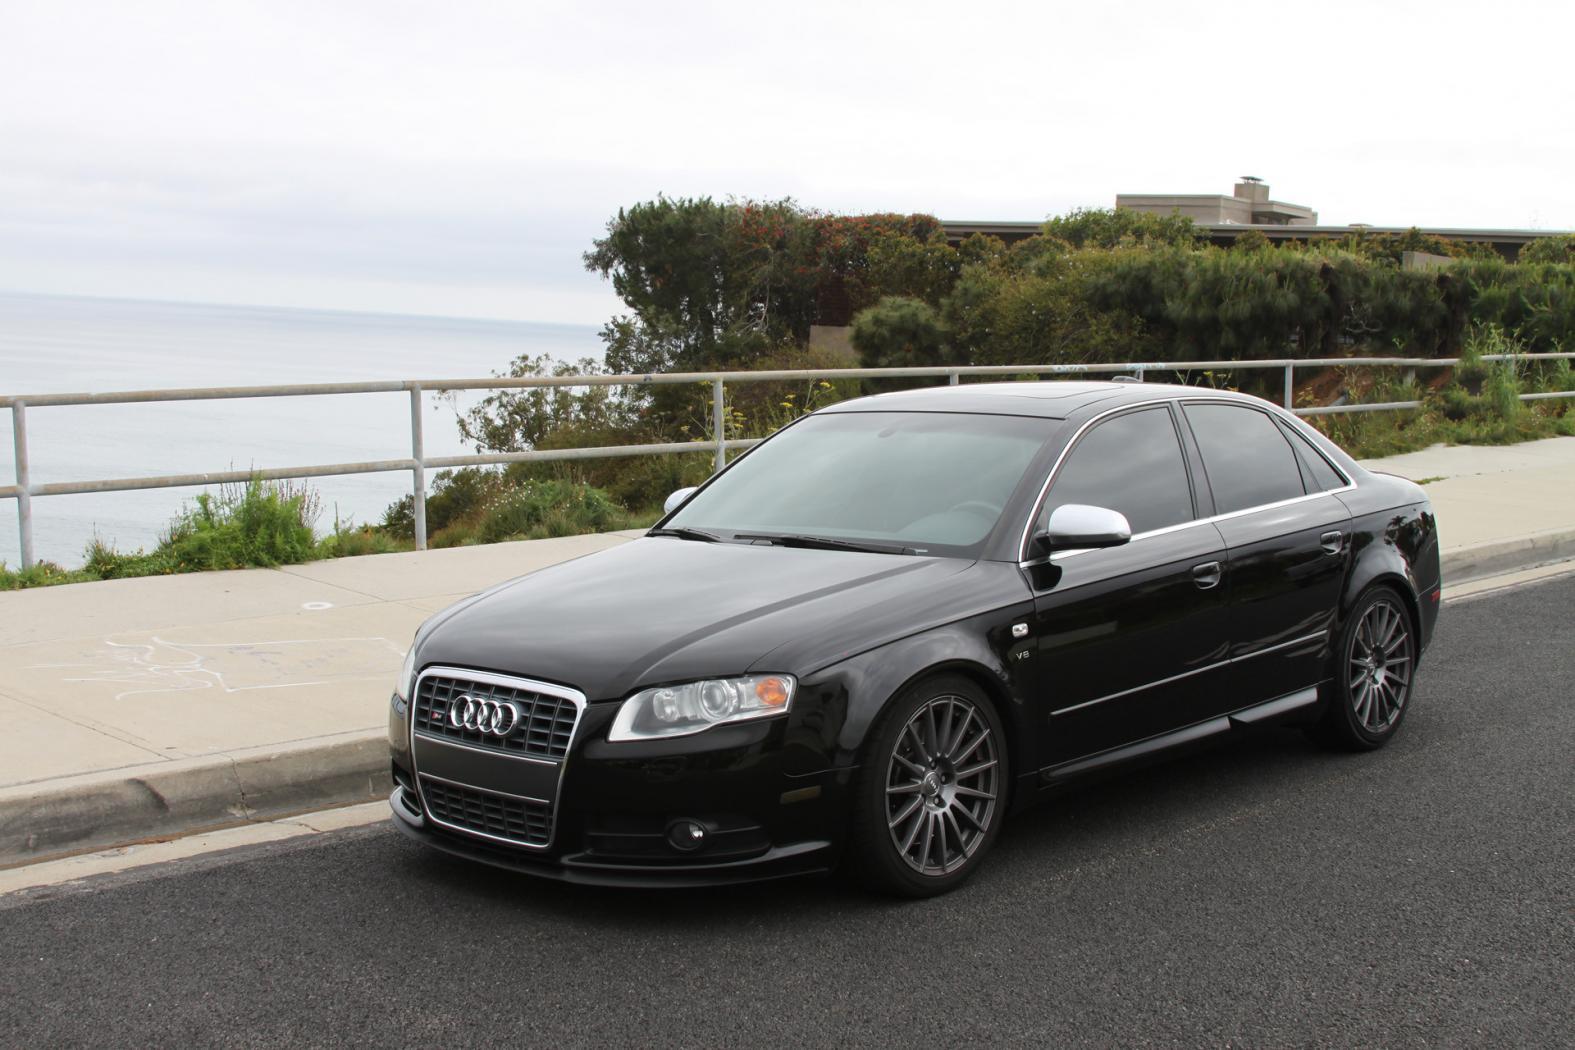 Audi-S4-B7-5